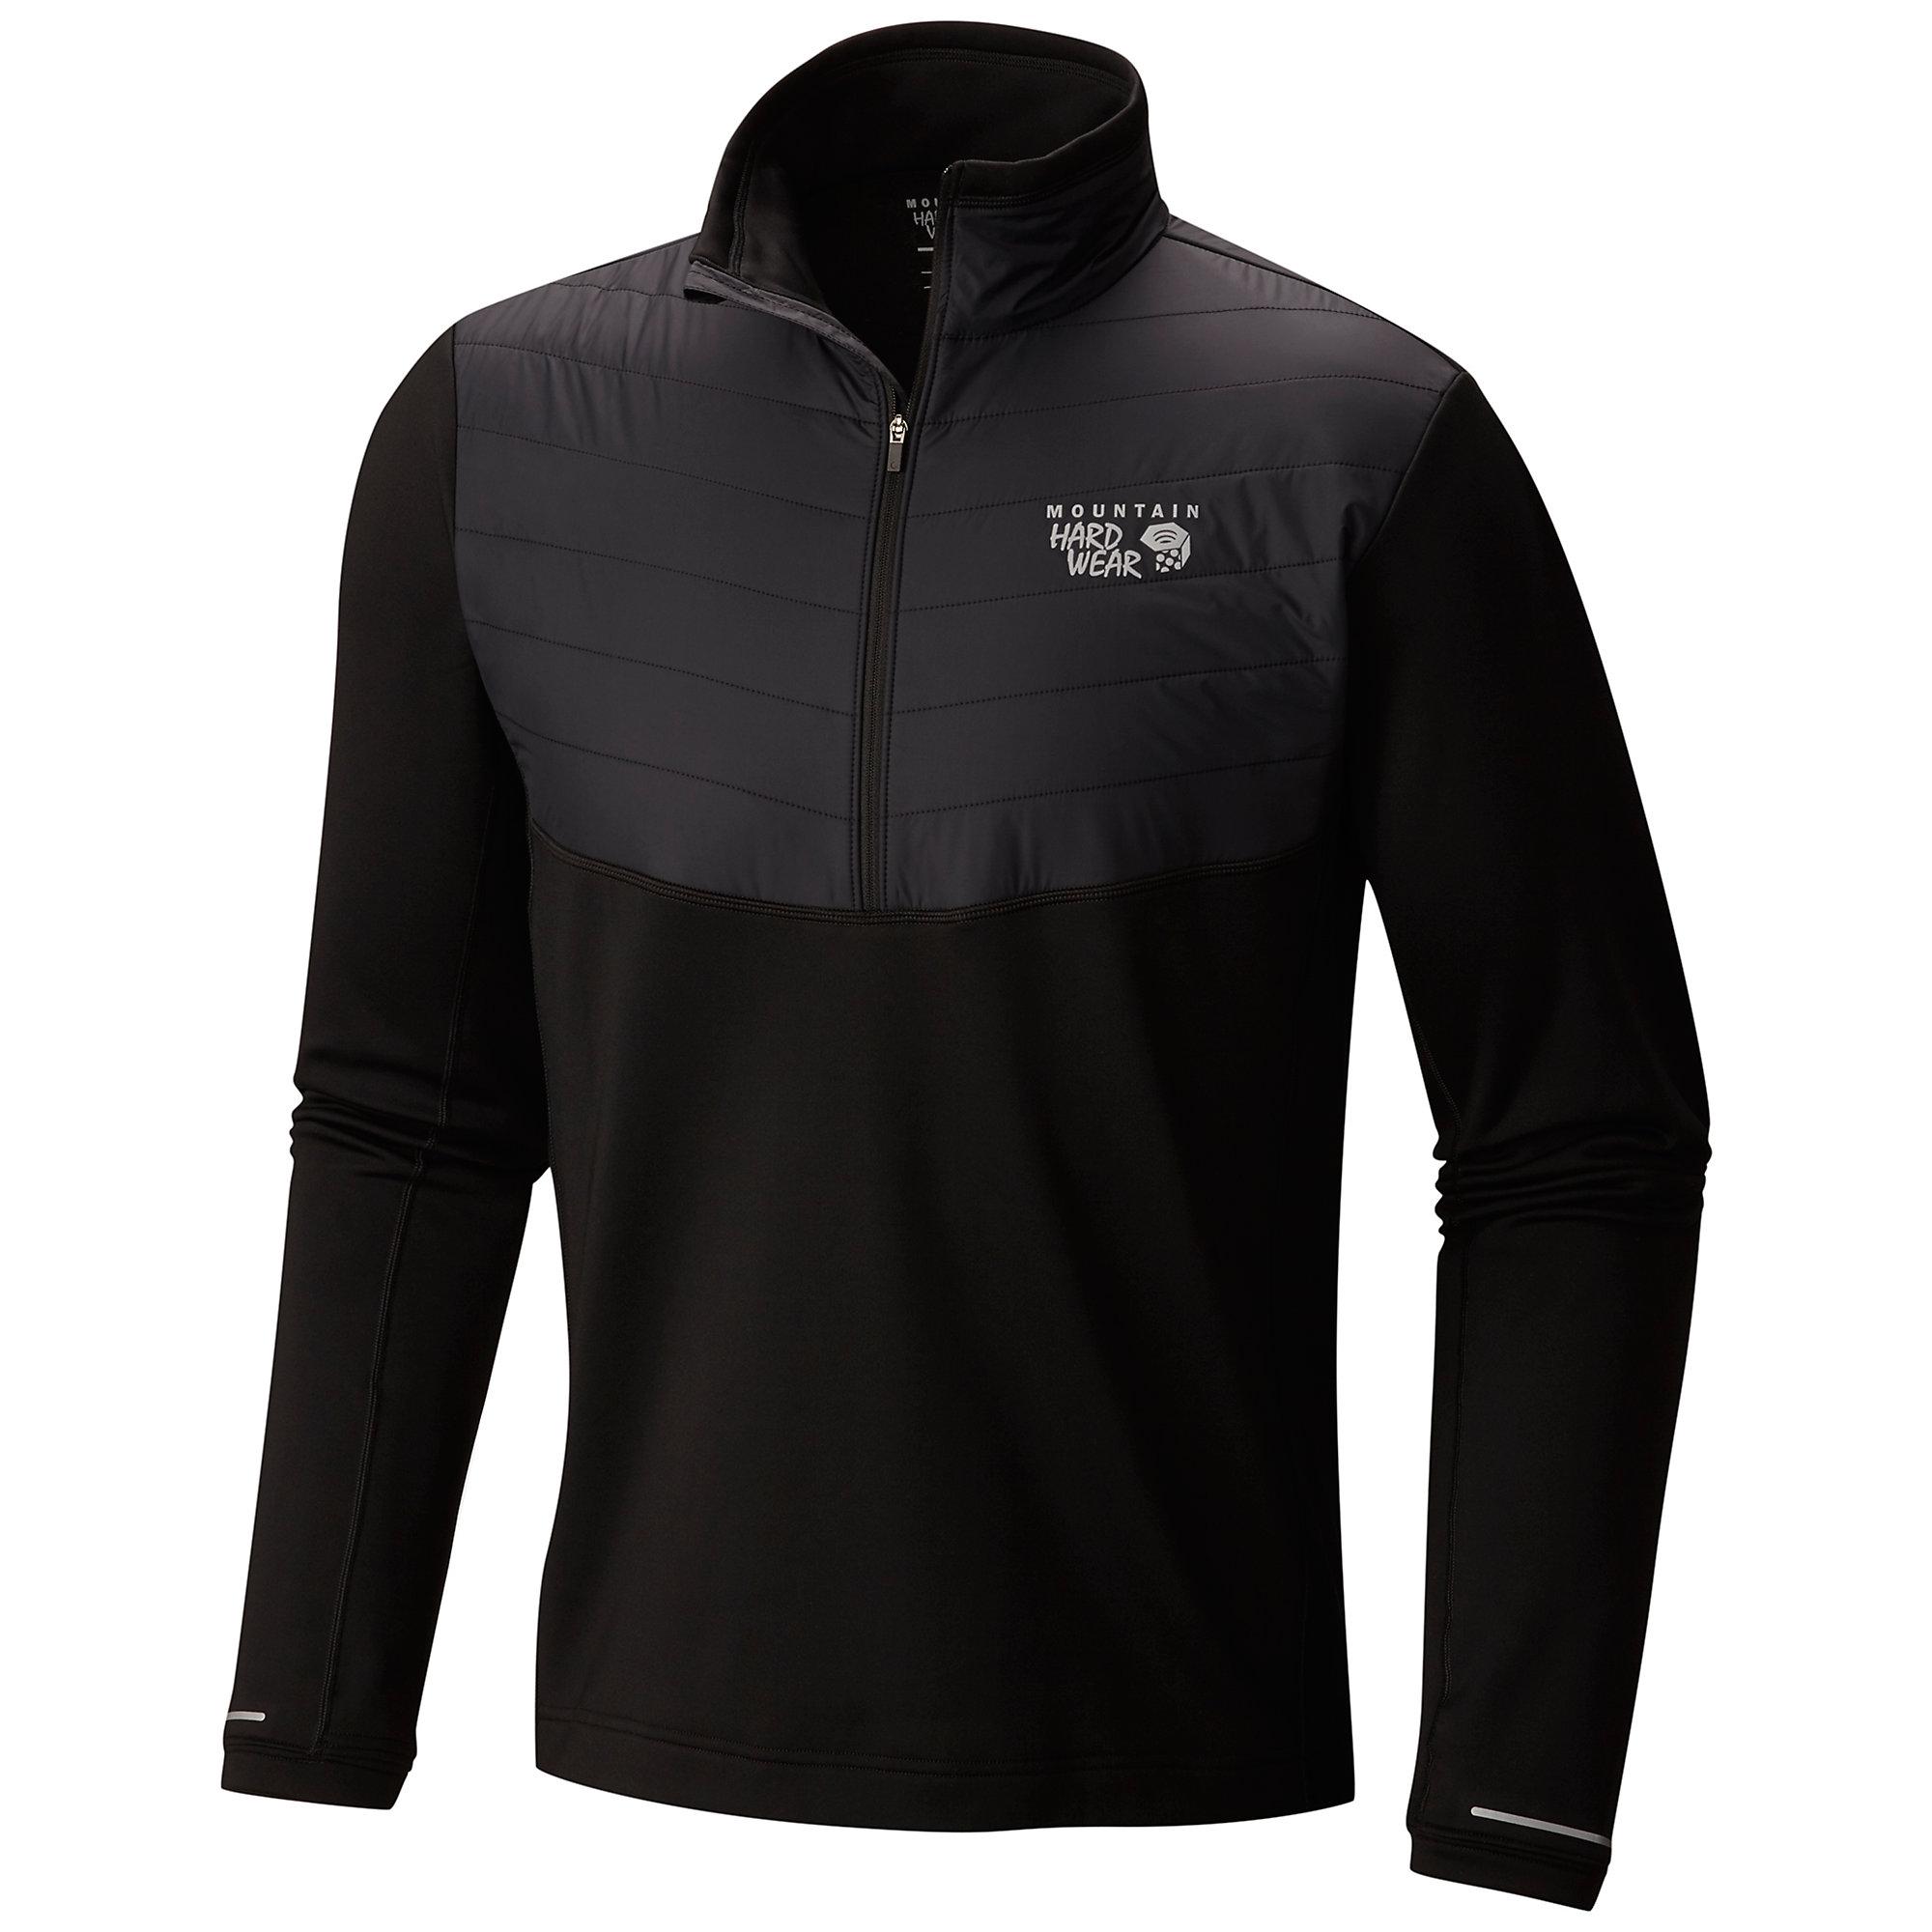 Mountain Hardwear 32 Degree Insulated 1/2 Zip